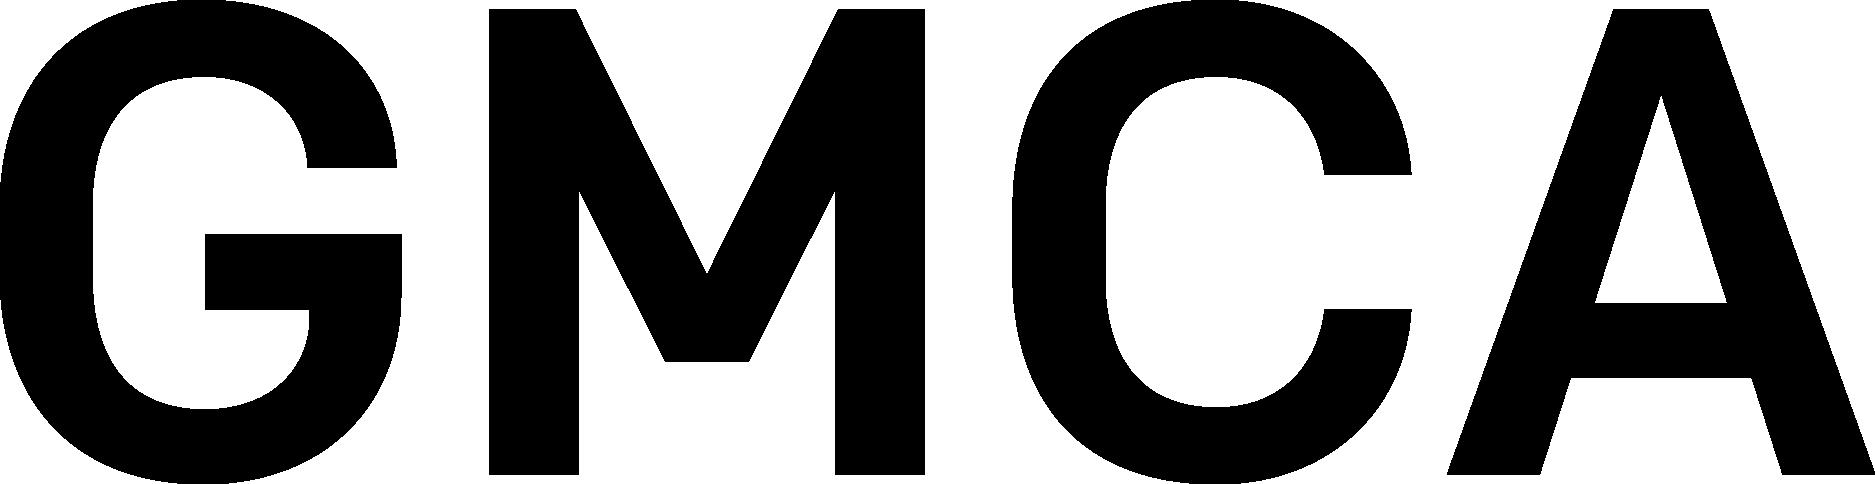 GMCA Black logo.png